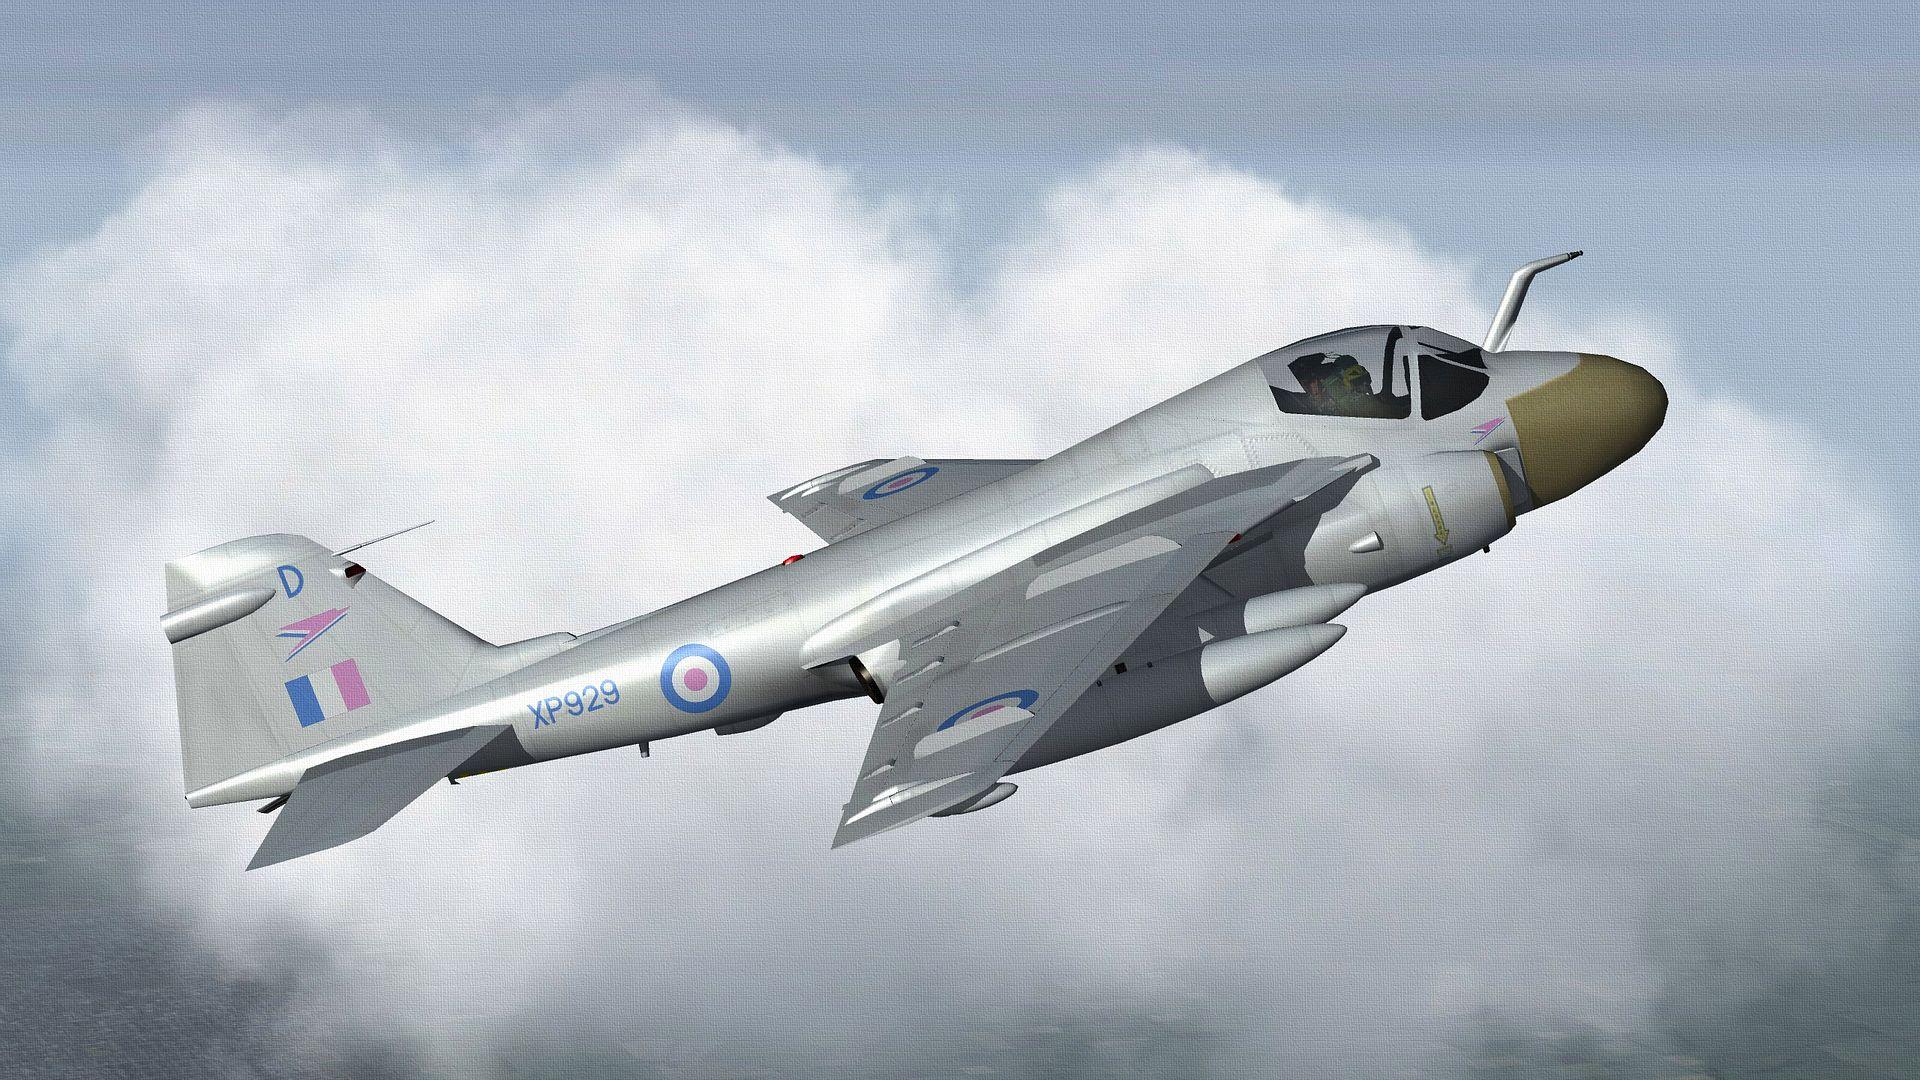 RAF%20INTRUDER%20S1.06_zpsnhalpmi3.jpg